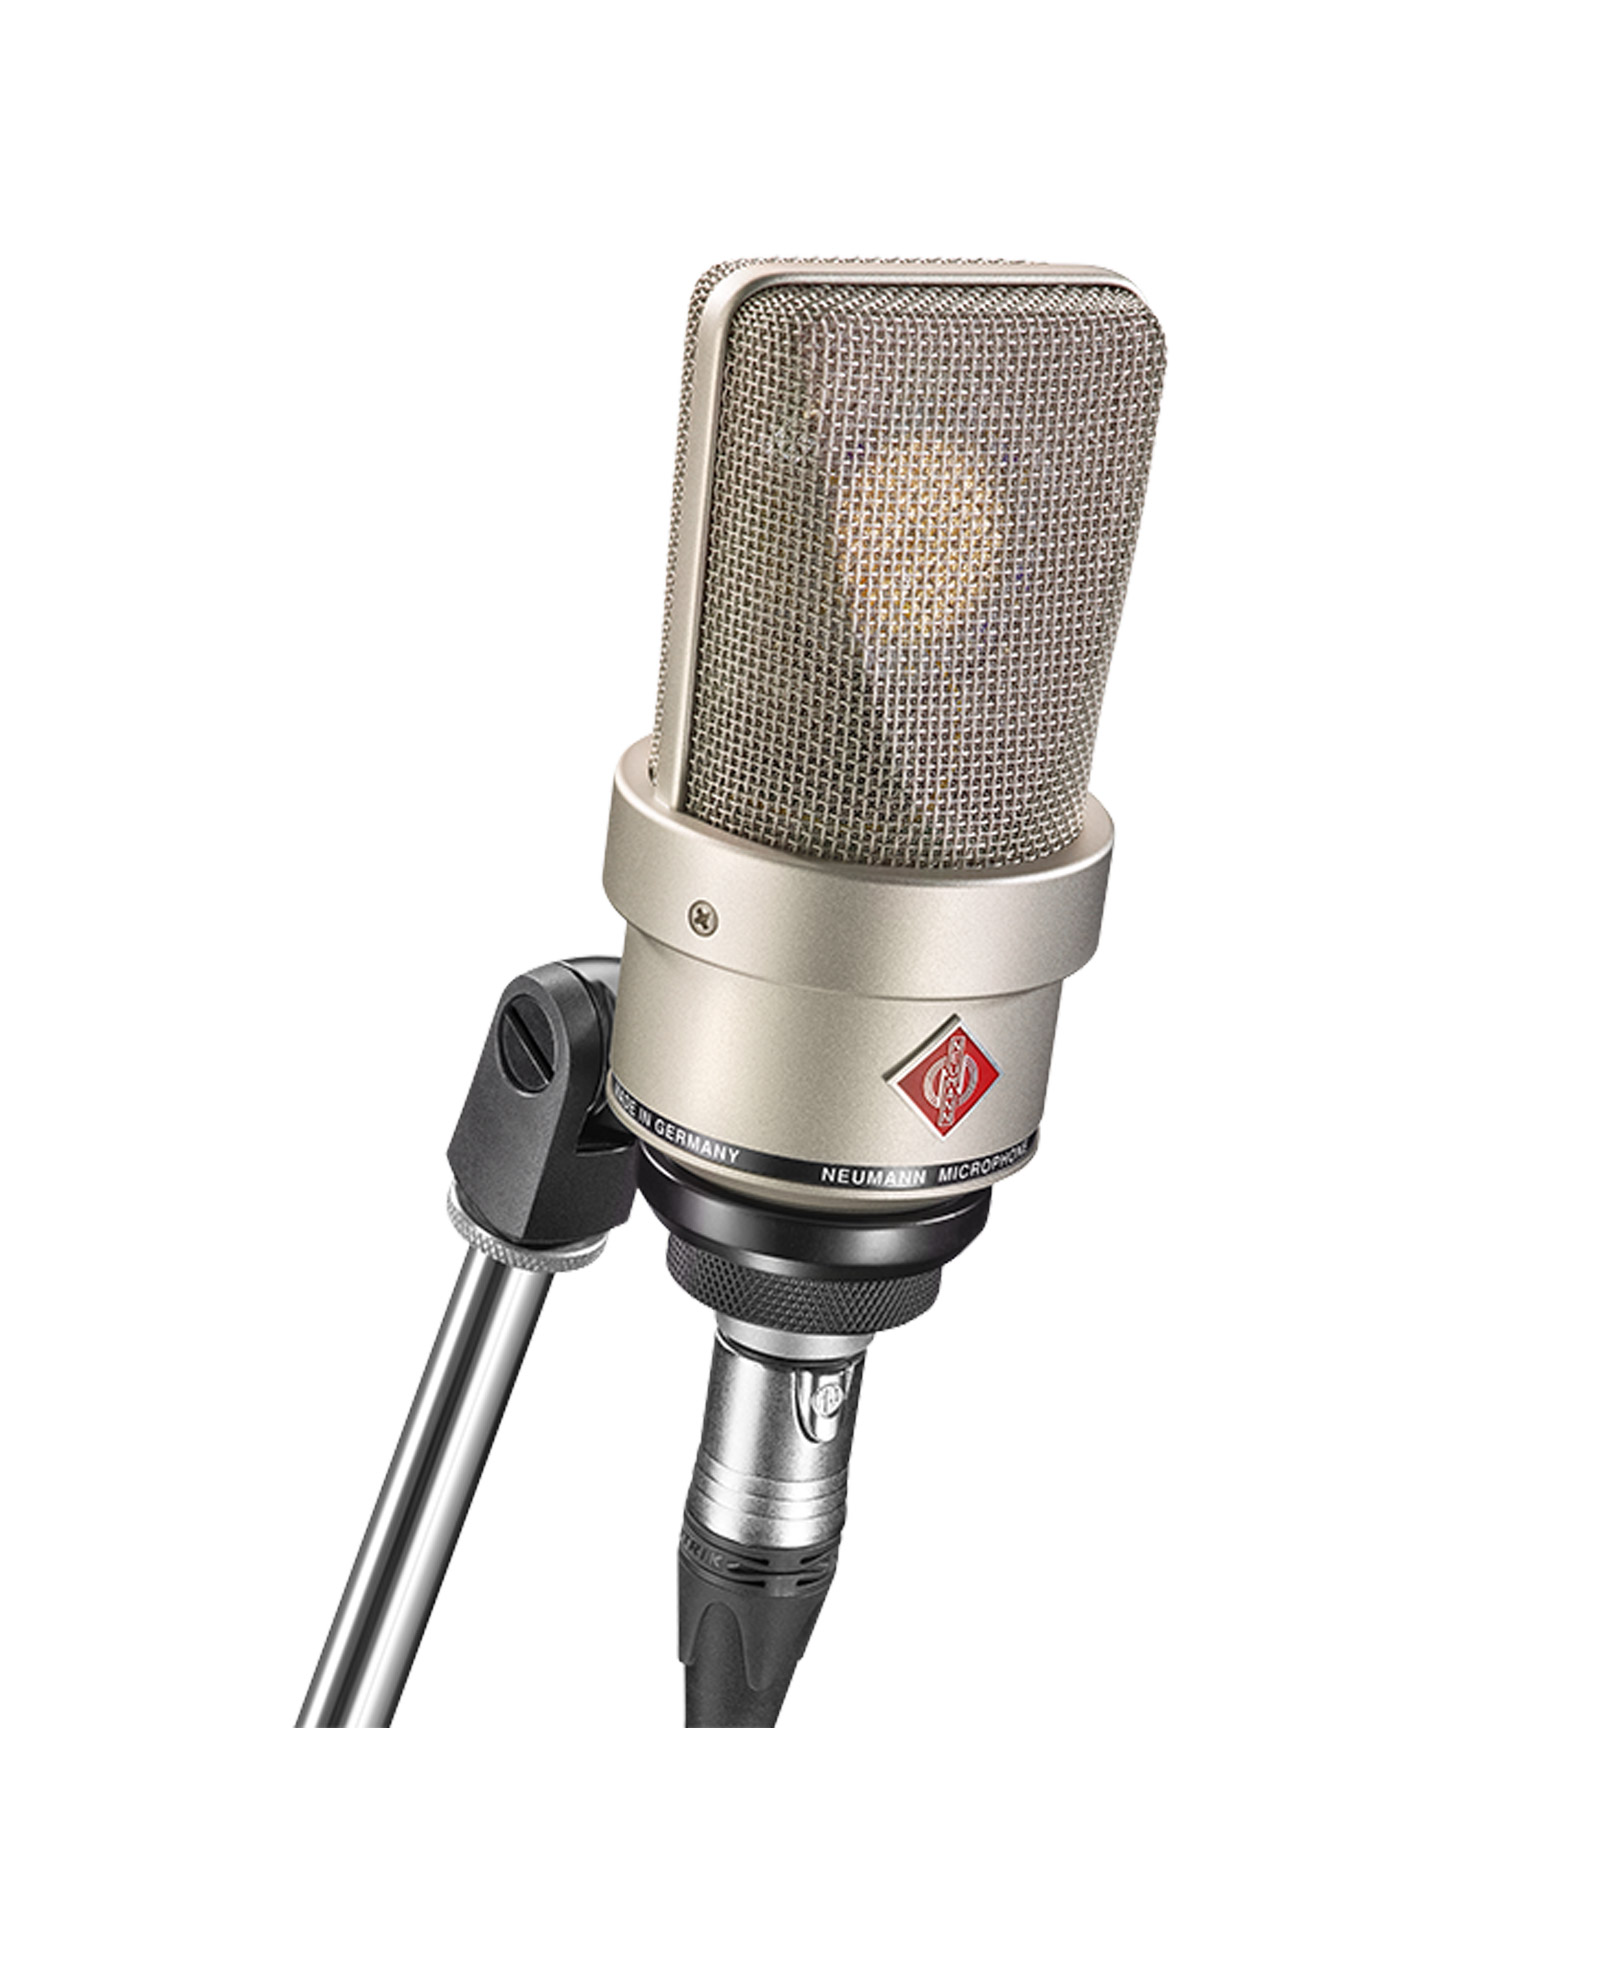 Neumann Tlm 103 large Diaphragm Condenser Microphone 1